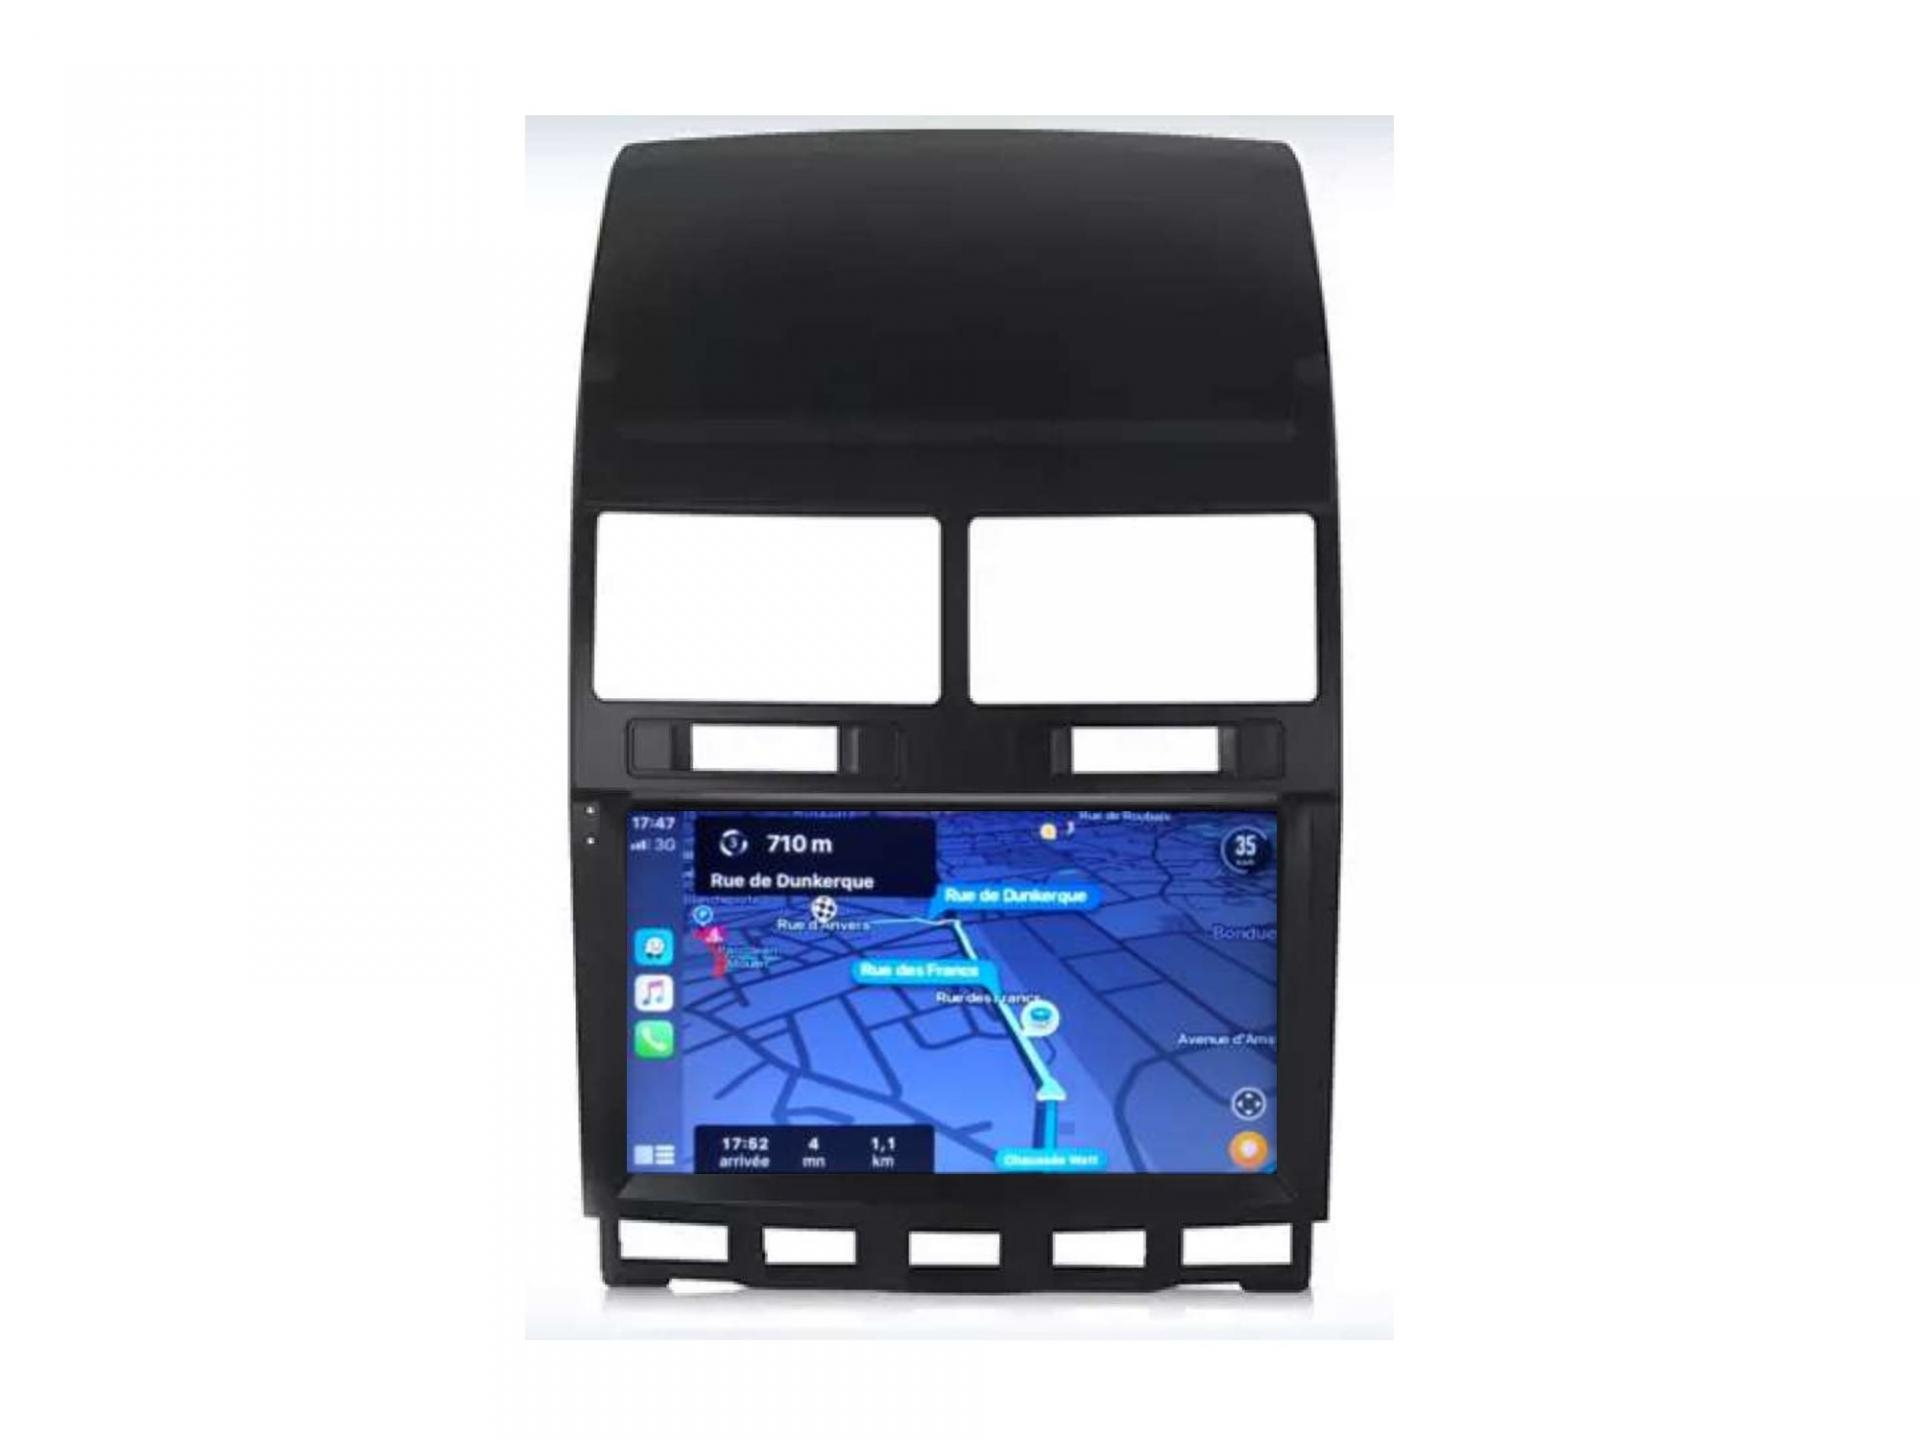 Vw touareg transporter t5 t6 autoradio gps carplay android auto bluetooth 3